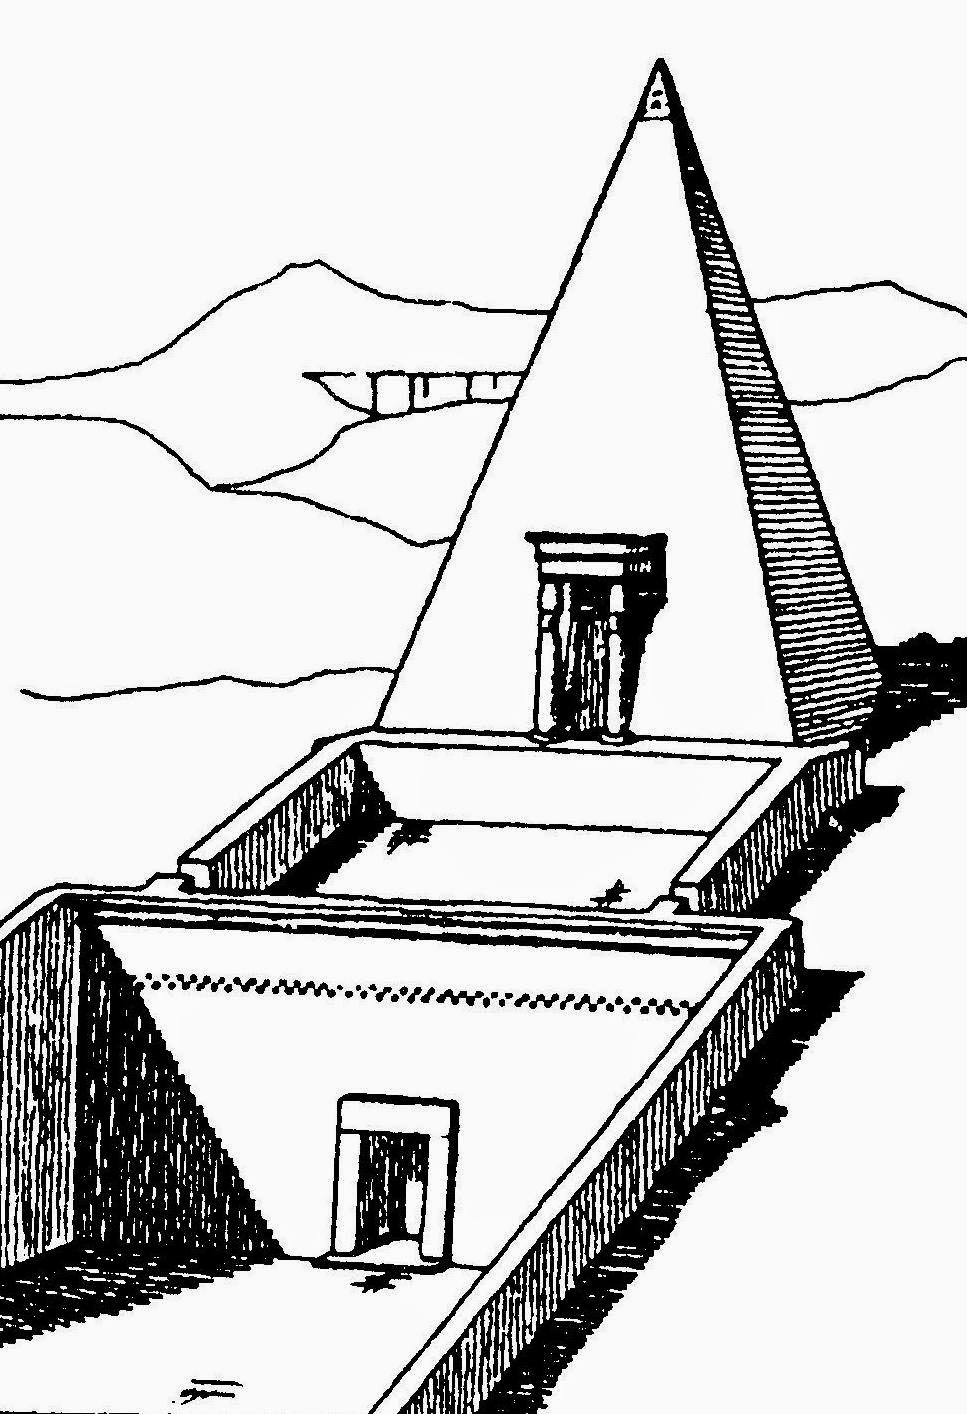 Deir el-Medina worker's tomb